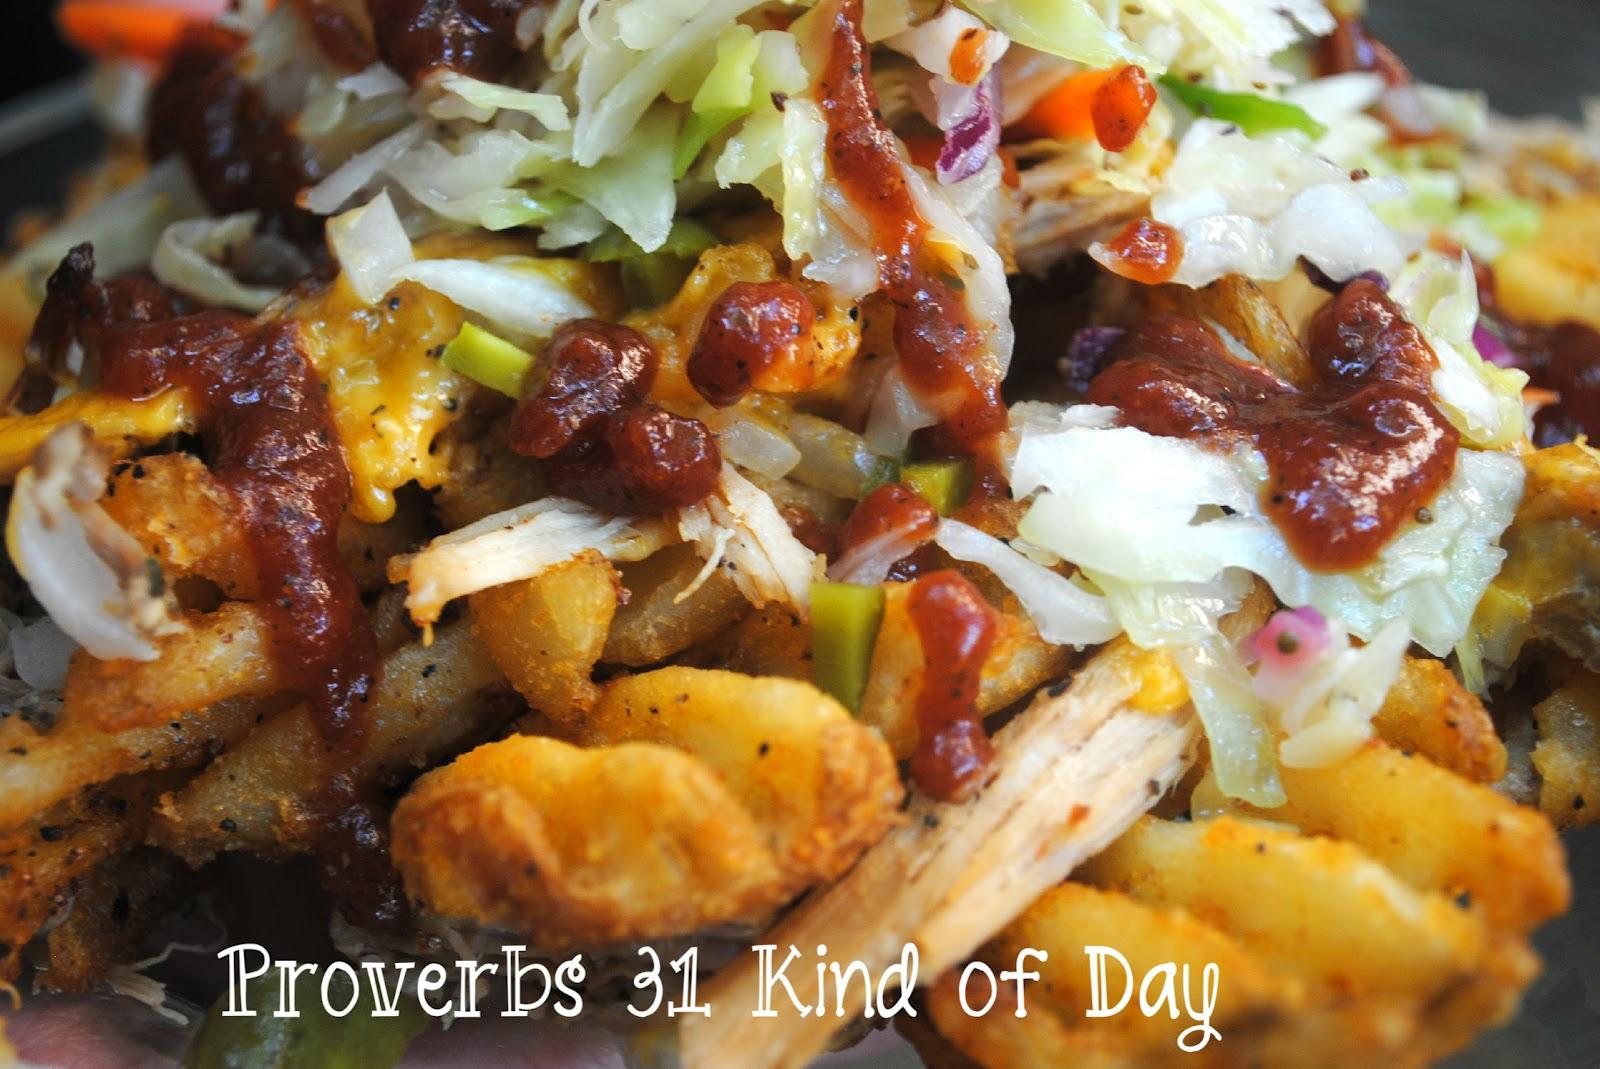 Proverbs 31 Kind of Day: Cowboy Nachos